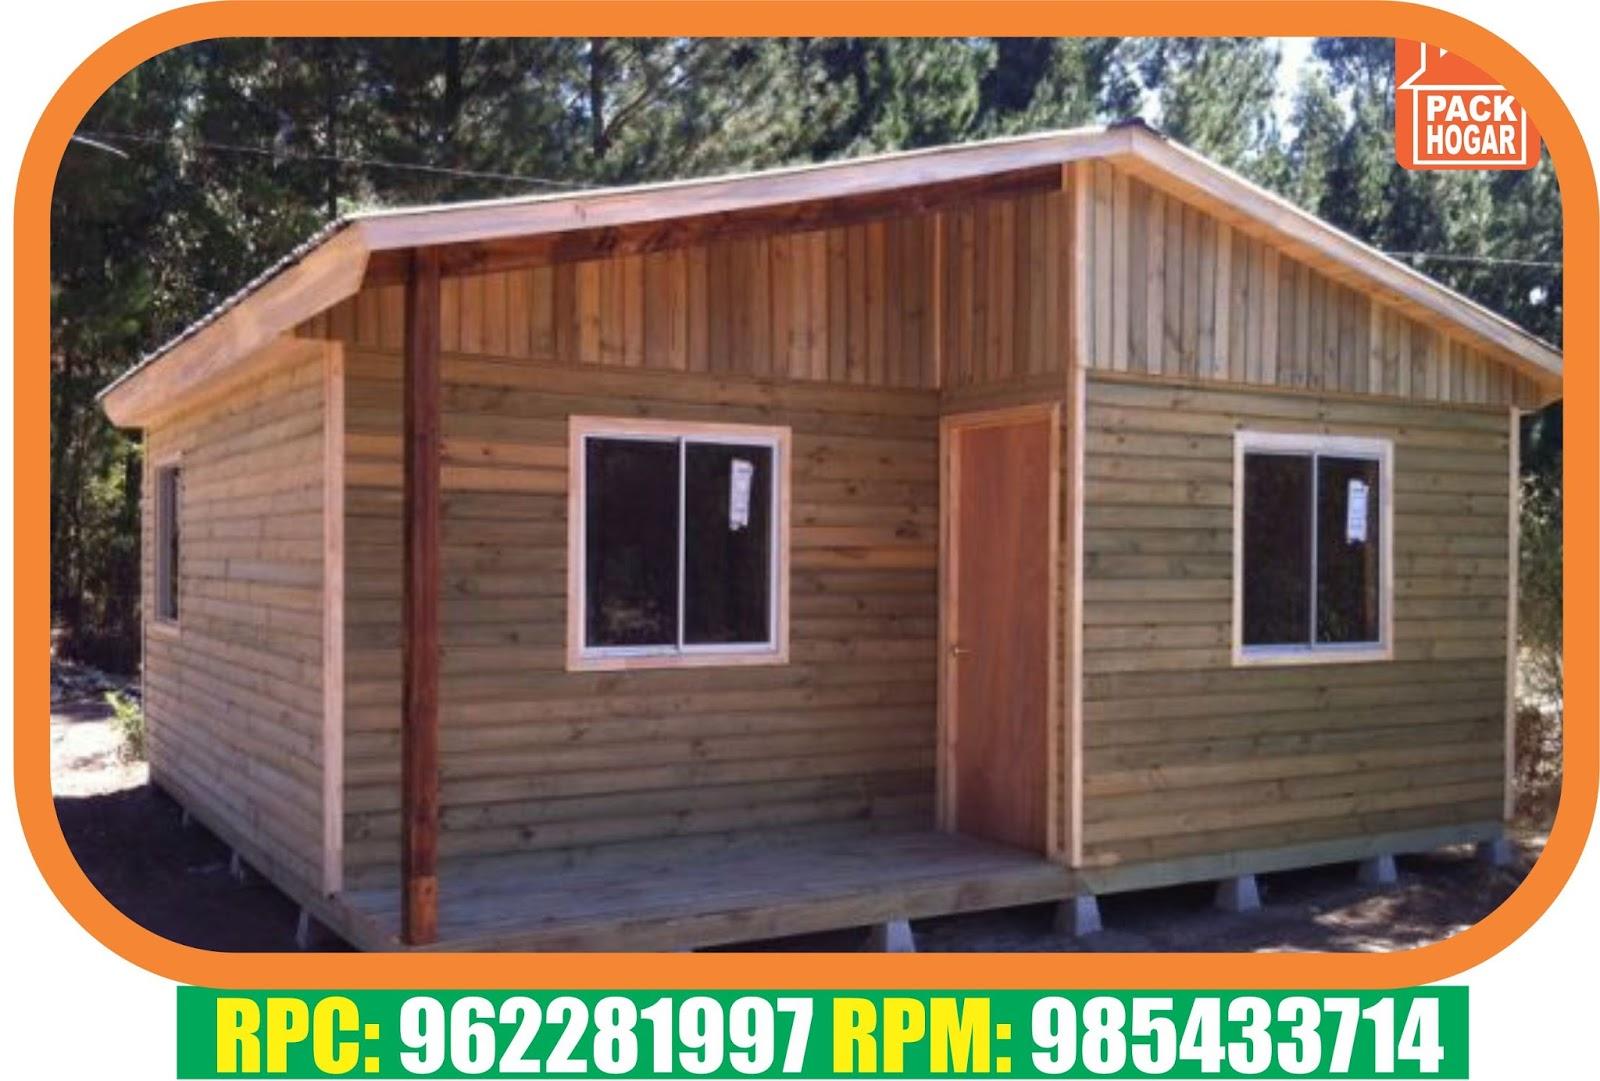 Casa de madera prefabricada 63m2 packhogar - Casa madera prefabricada ...